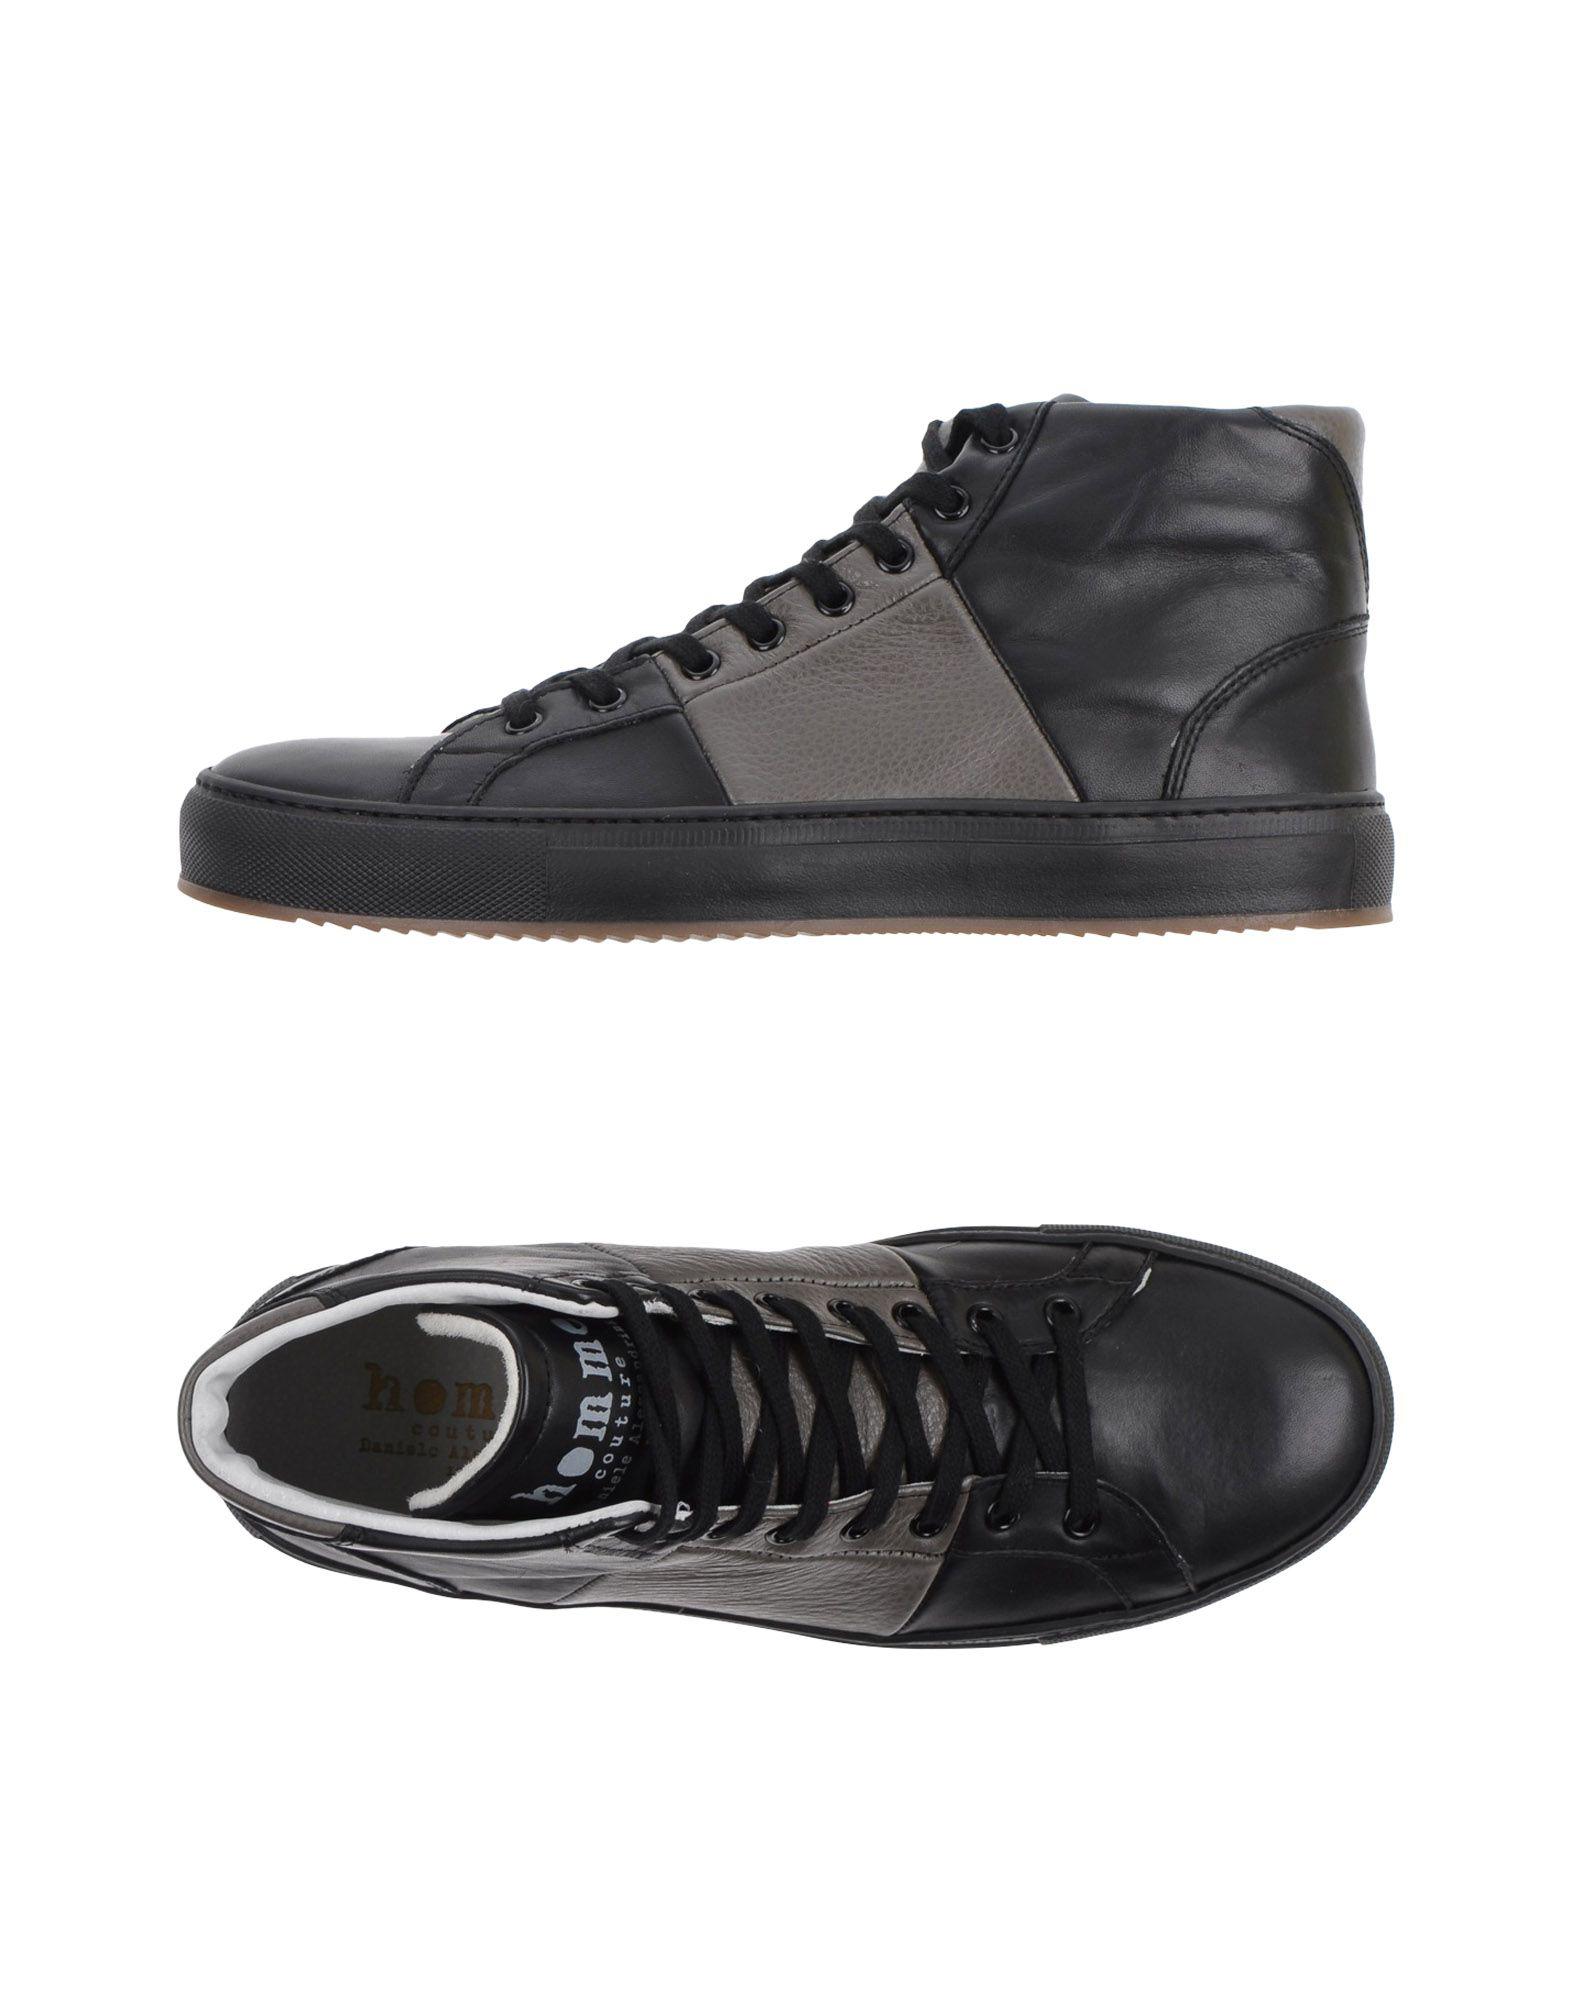 DANIELE ALESSANDRINI HOMME Высокие кеды и кроссовки dior homme высокие кеды и кроссовки